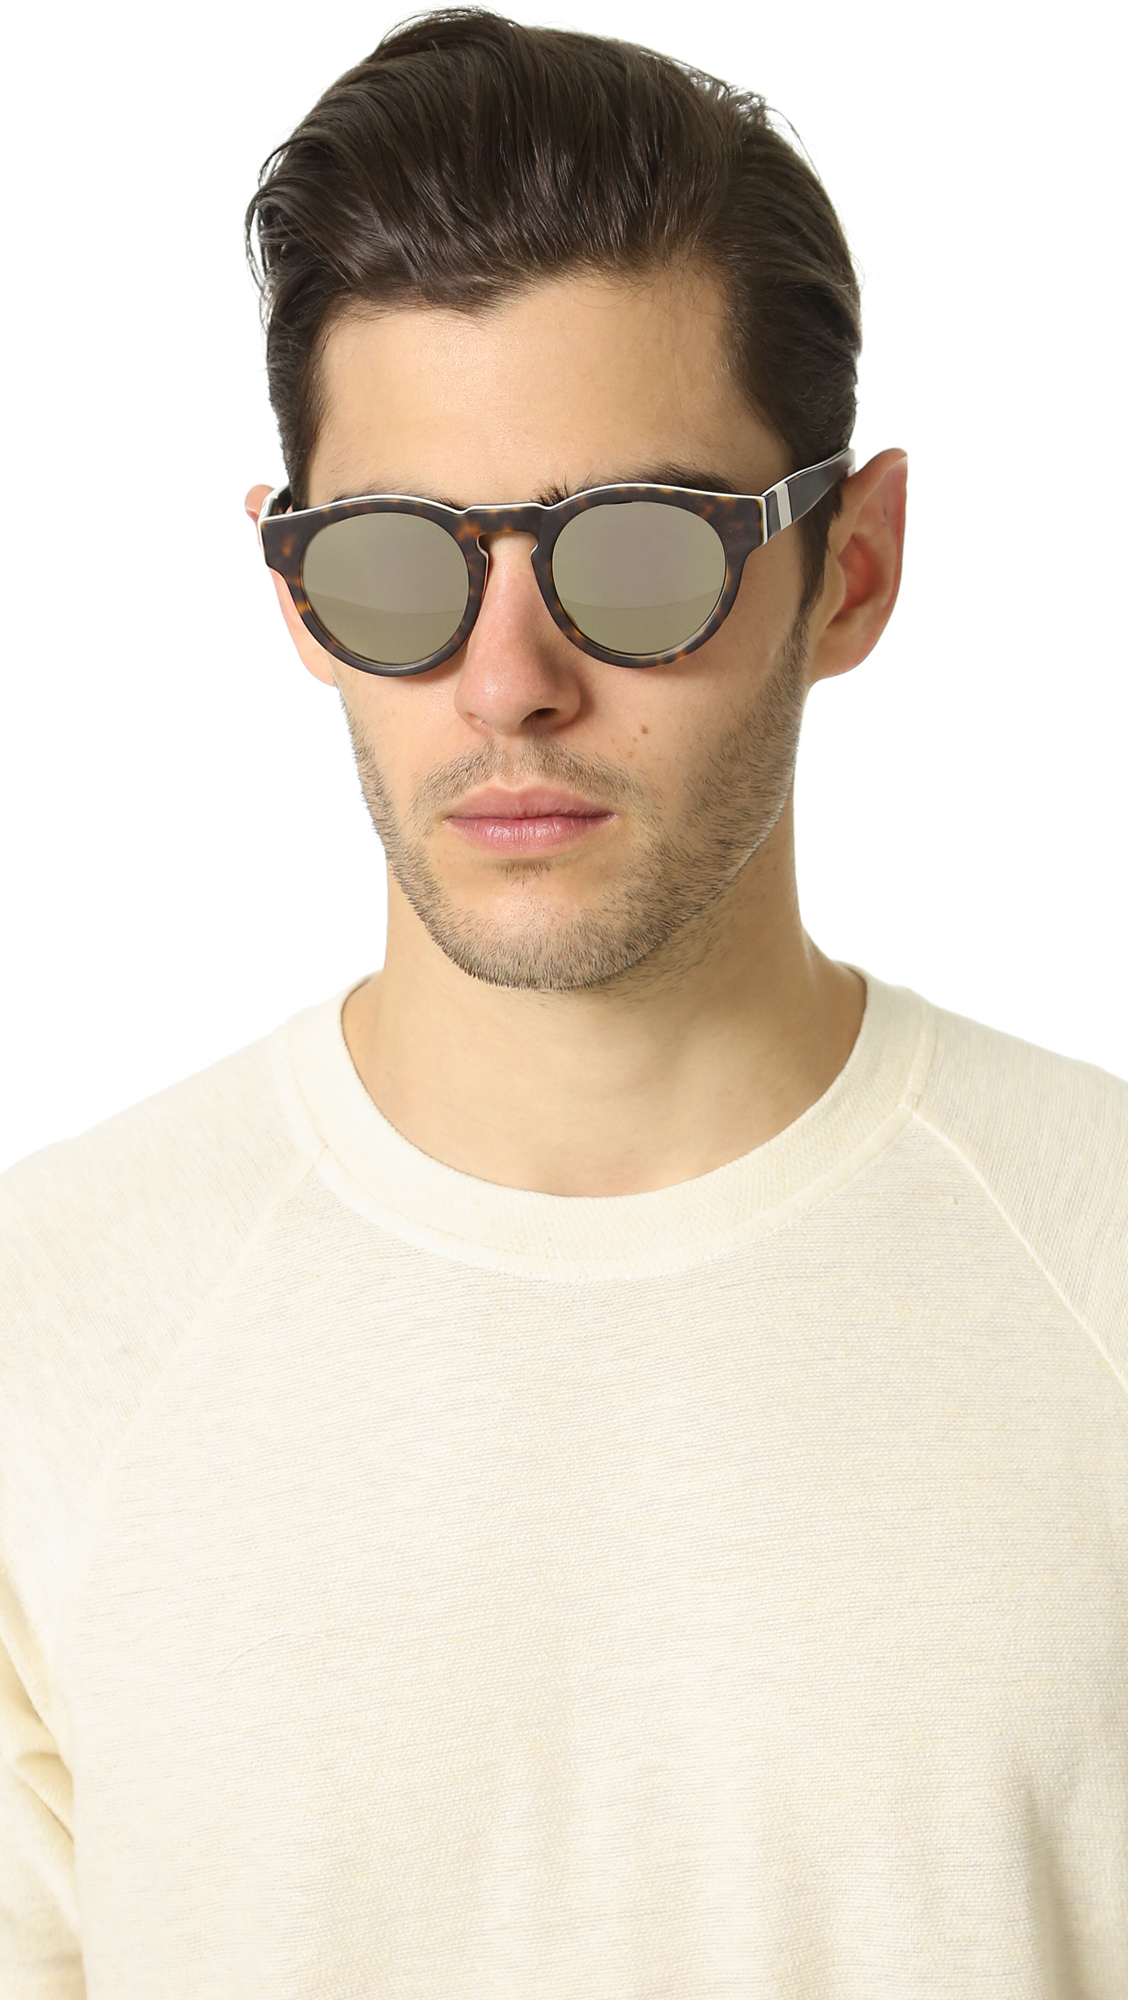 7fb5d36500 Lyst - Westward Leaning Voyager 10 Sunglasses in Black for Men